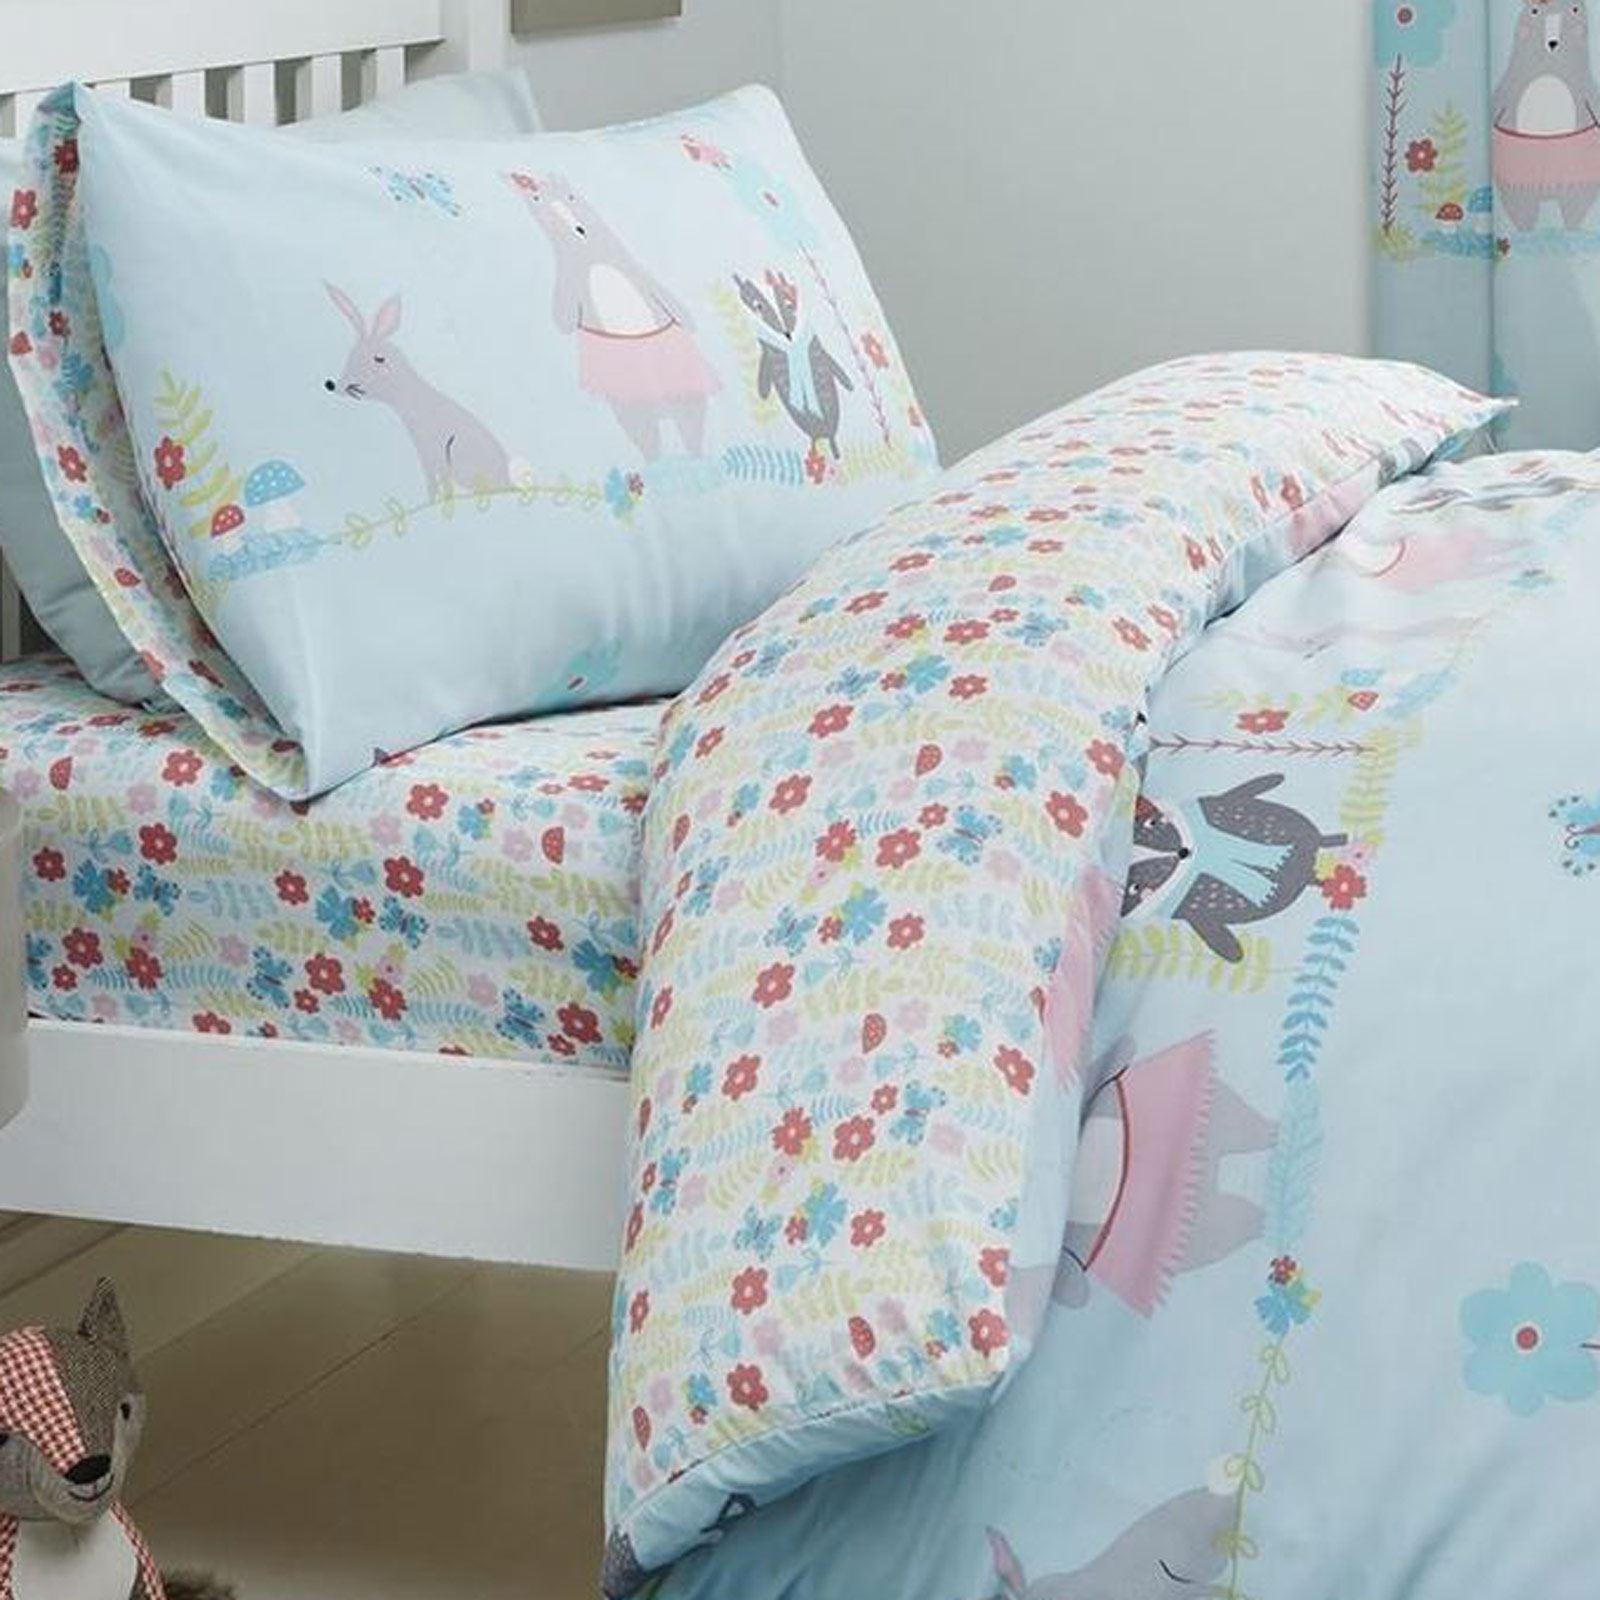 Kids-Duvet-Covers-Blue-Woodland-Animals-Cute-Reversible-Print-Quilt-Bedding-Sets thumbnail 10